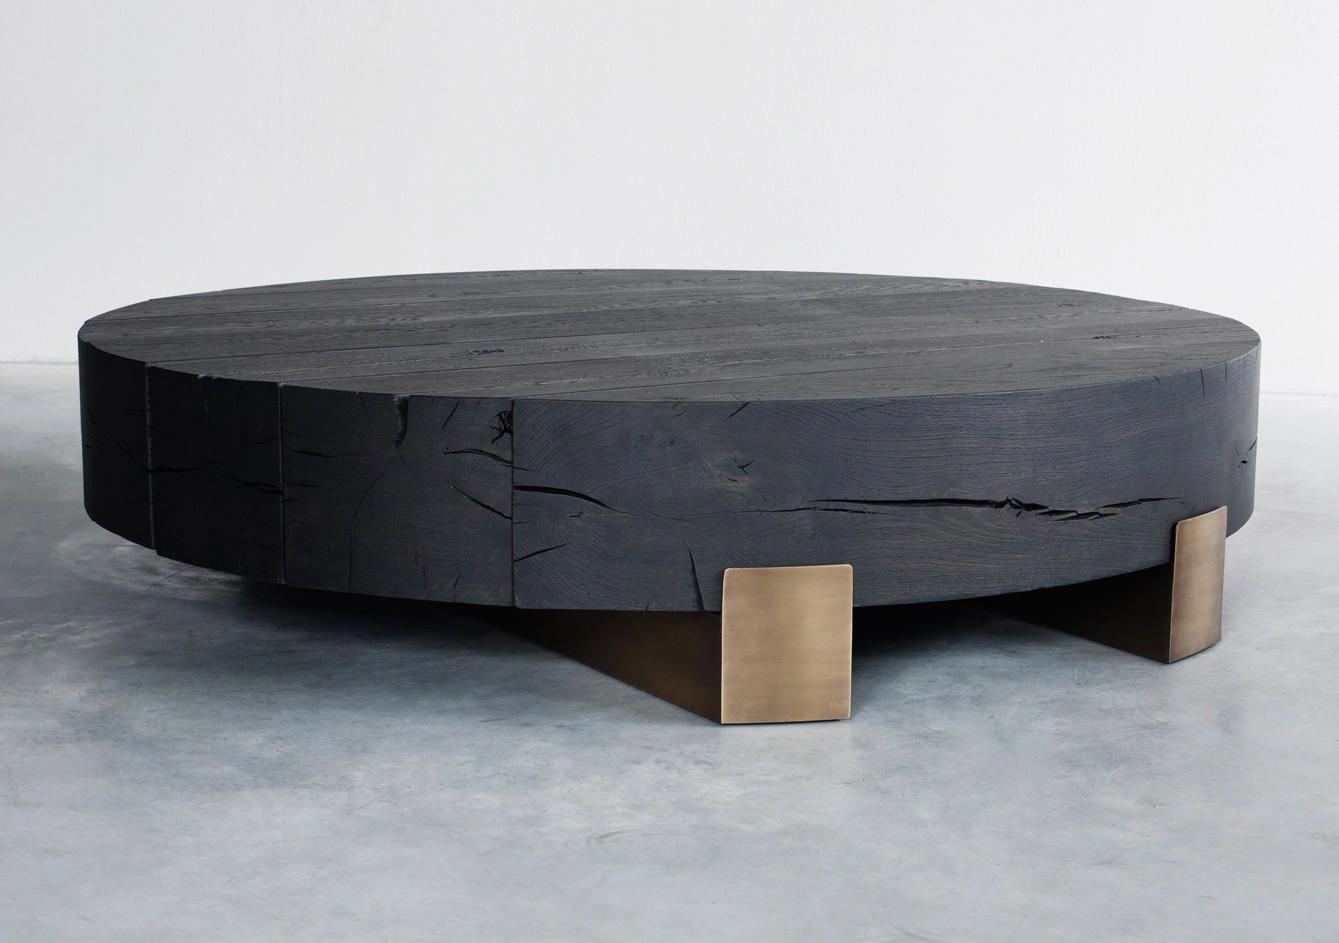 22 Modern Coffee Tables Designs Interesting Best Unique And Classy Coffee Table Wood Coffee Table Coffee Table Design [ 943 x 1339 Pixel ]